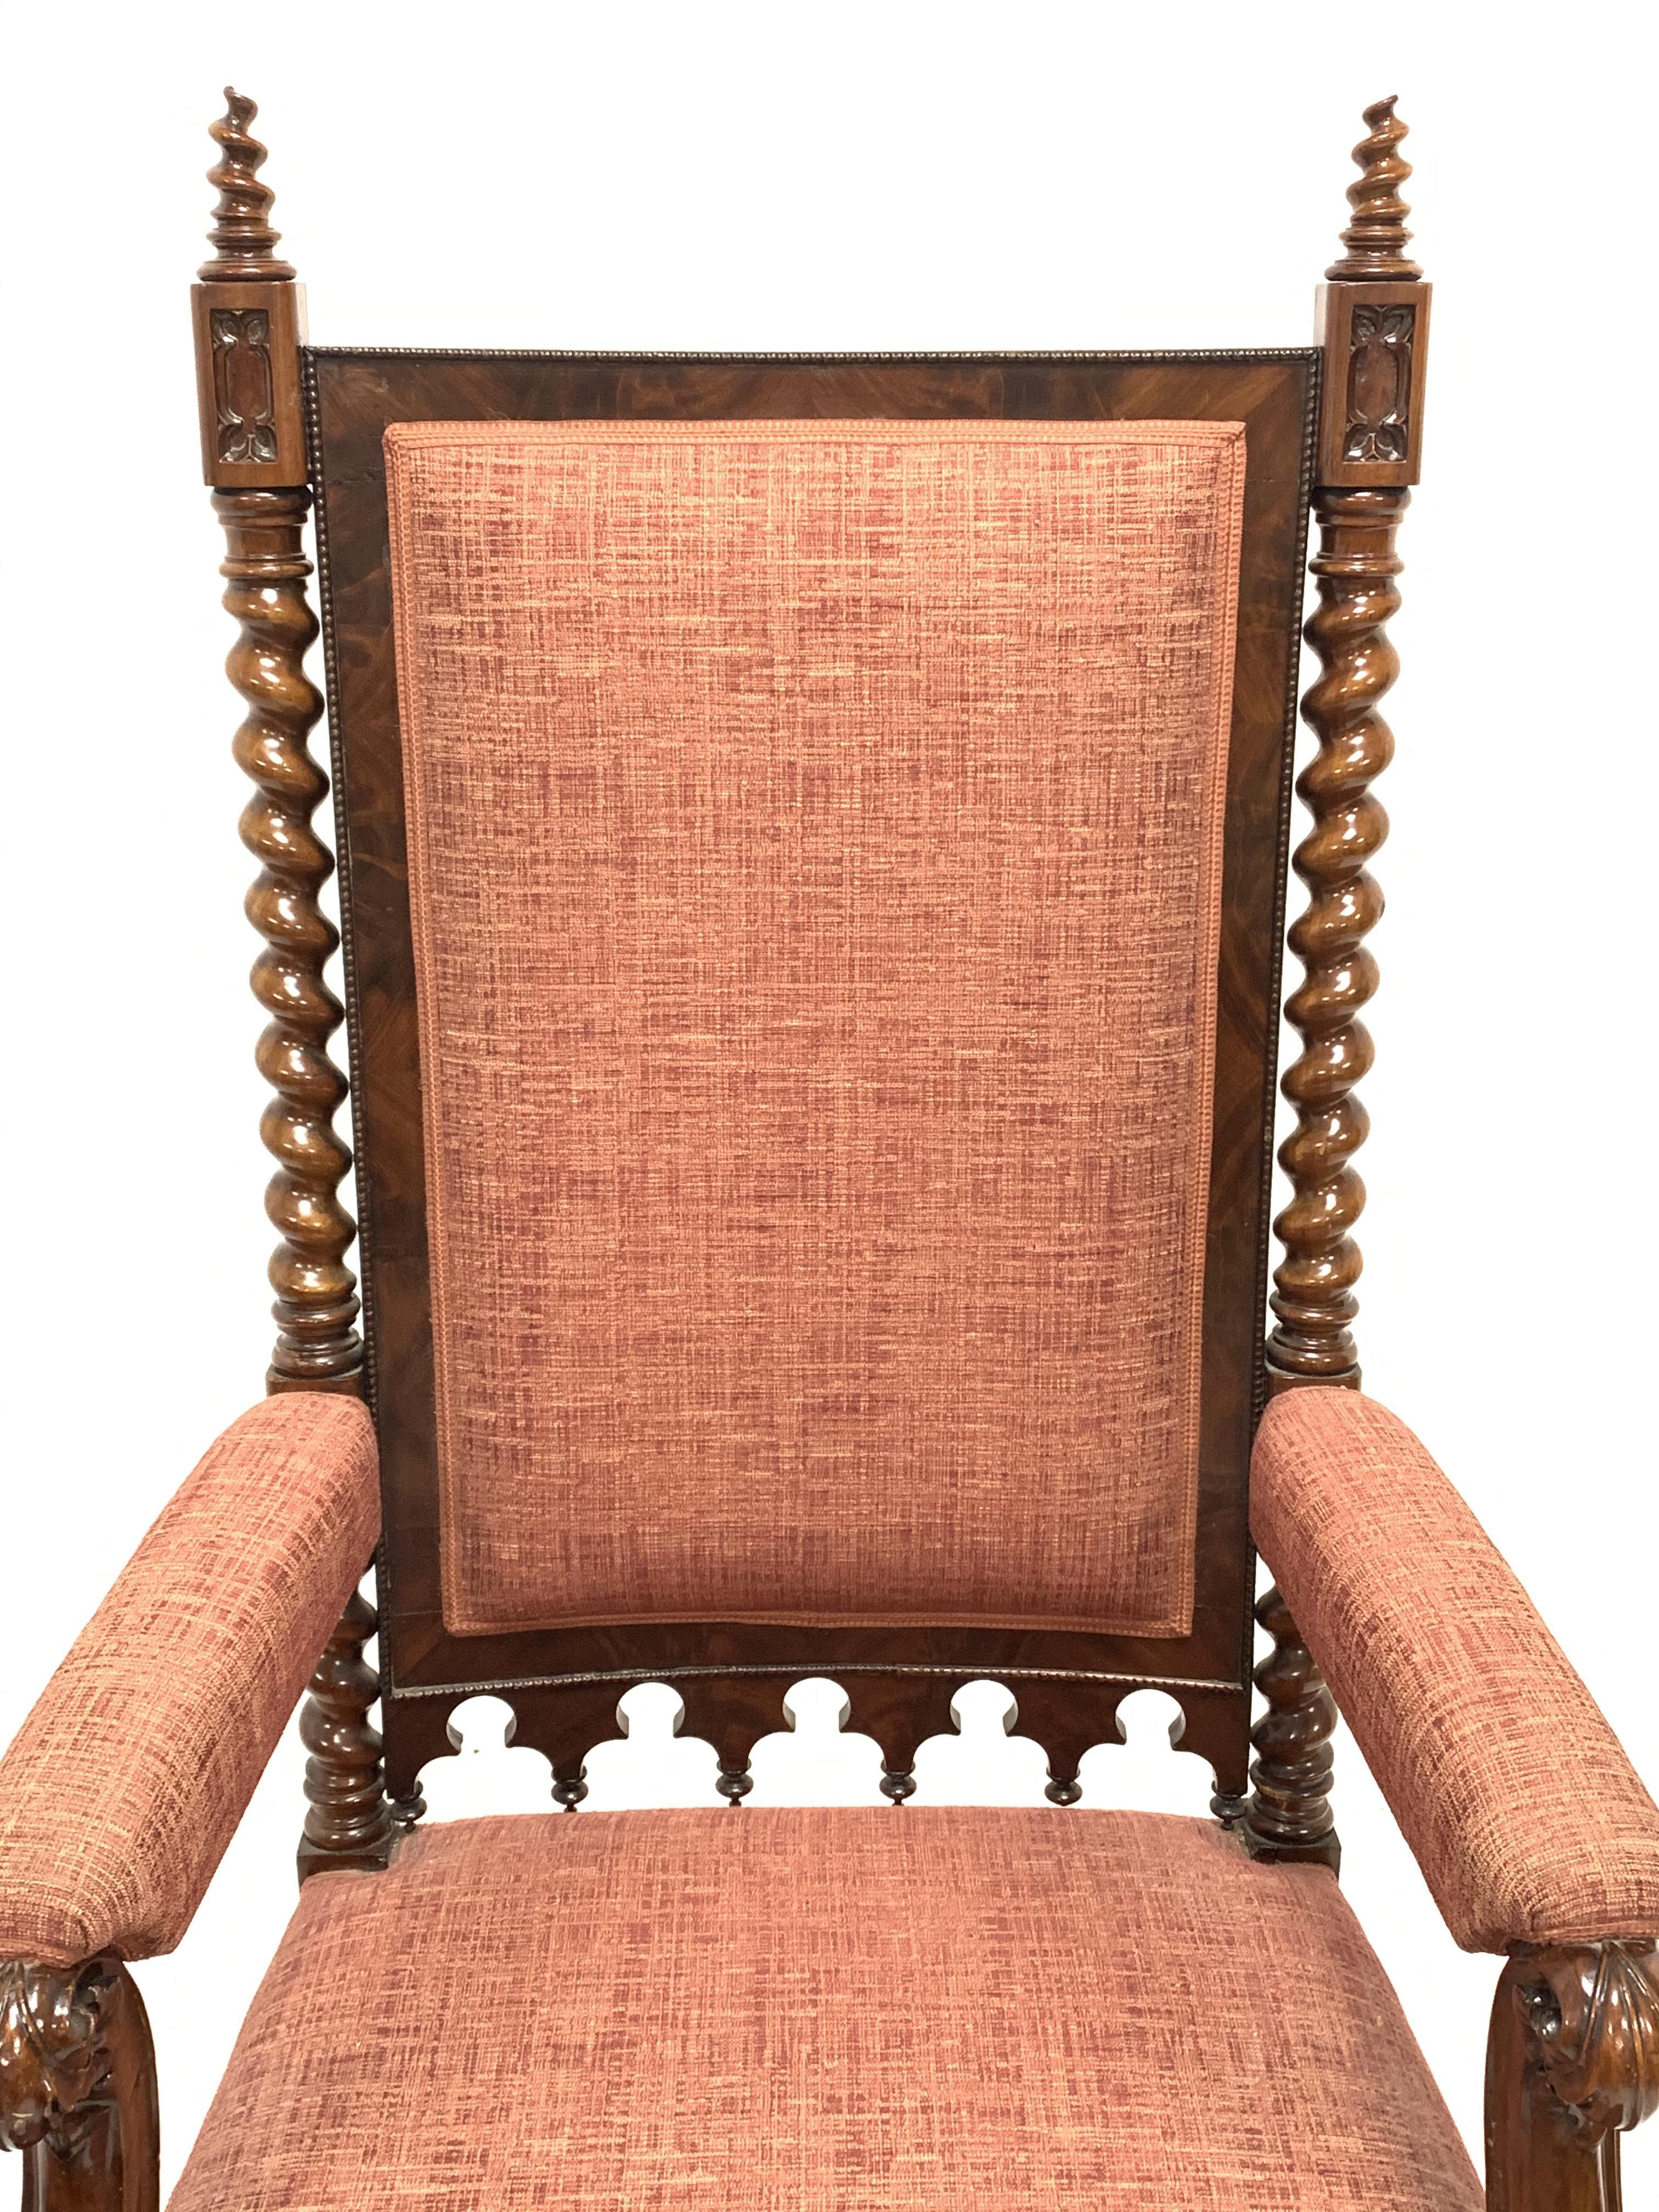 19th century Puginesque mahogany throne chair - Image 6 of 6